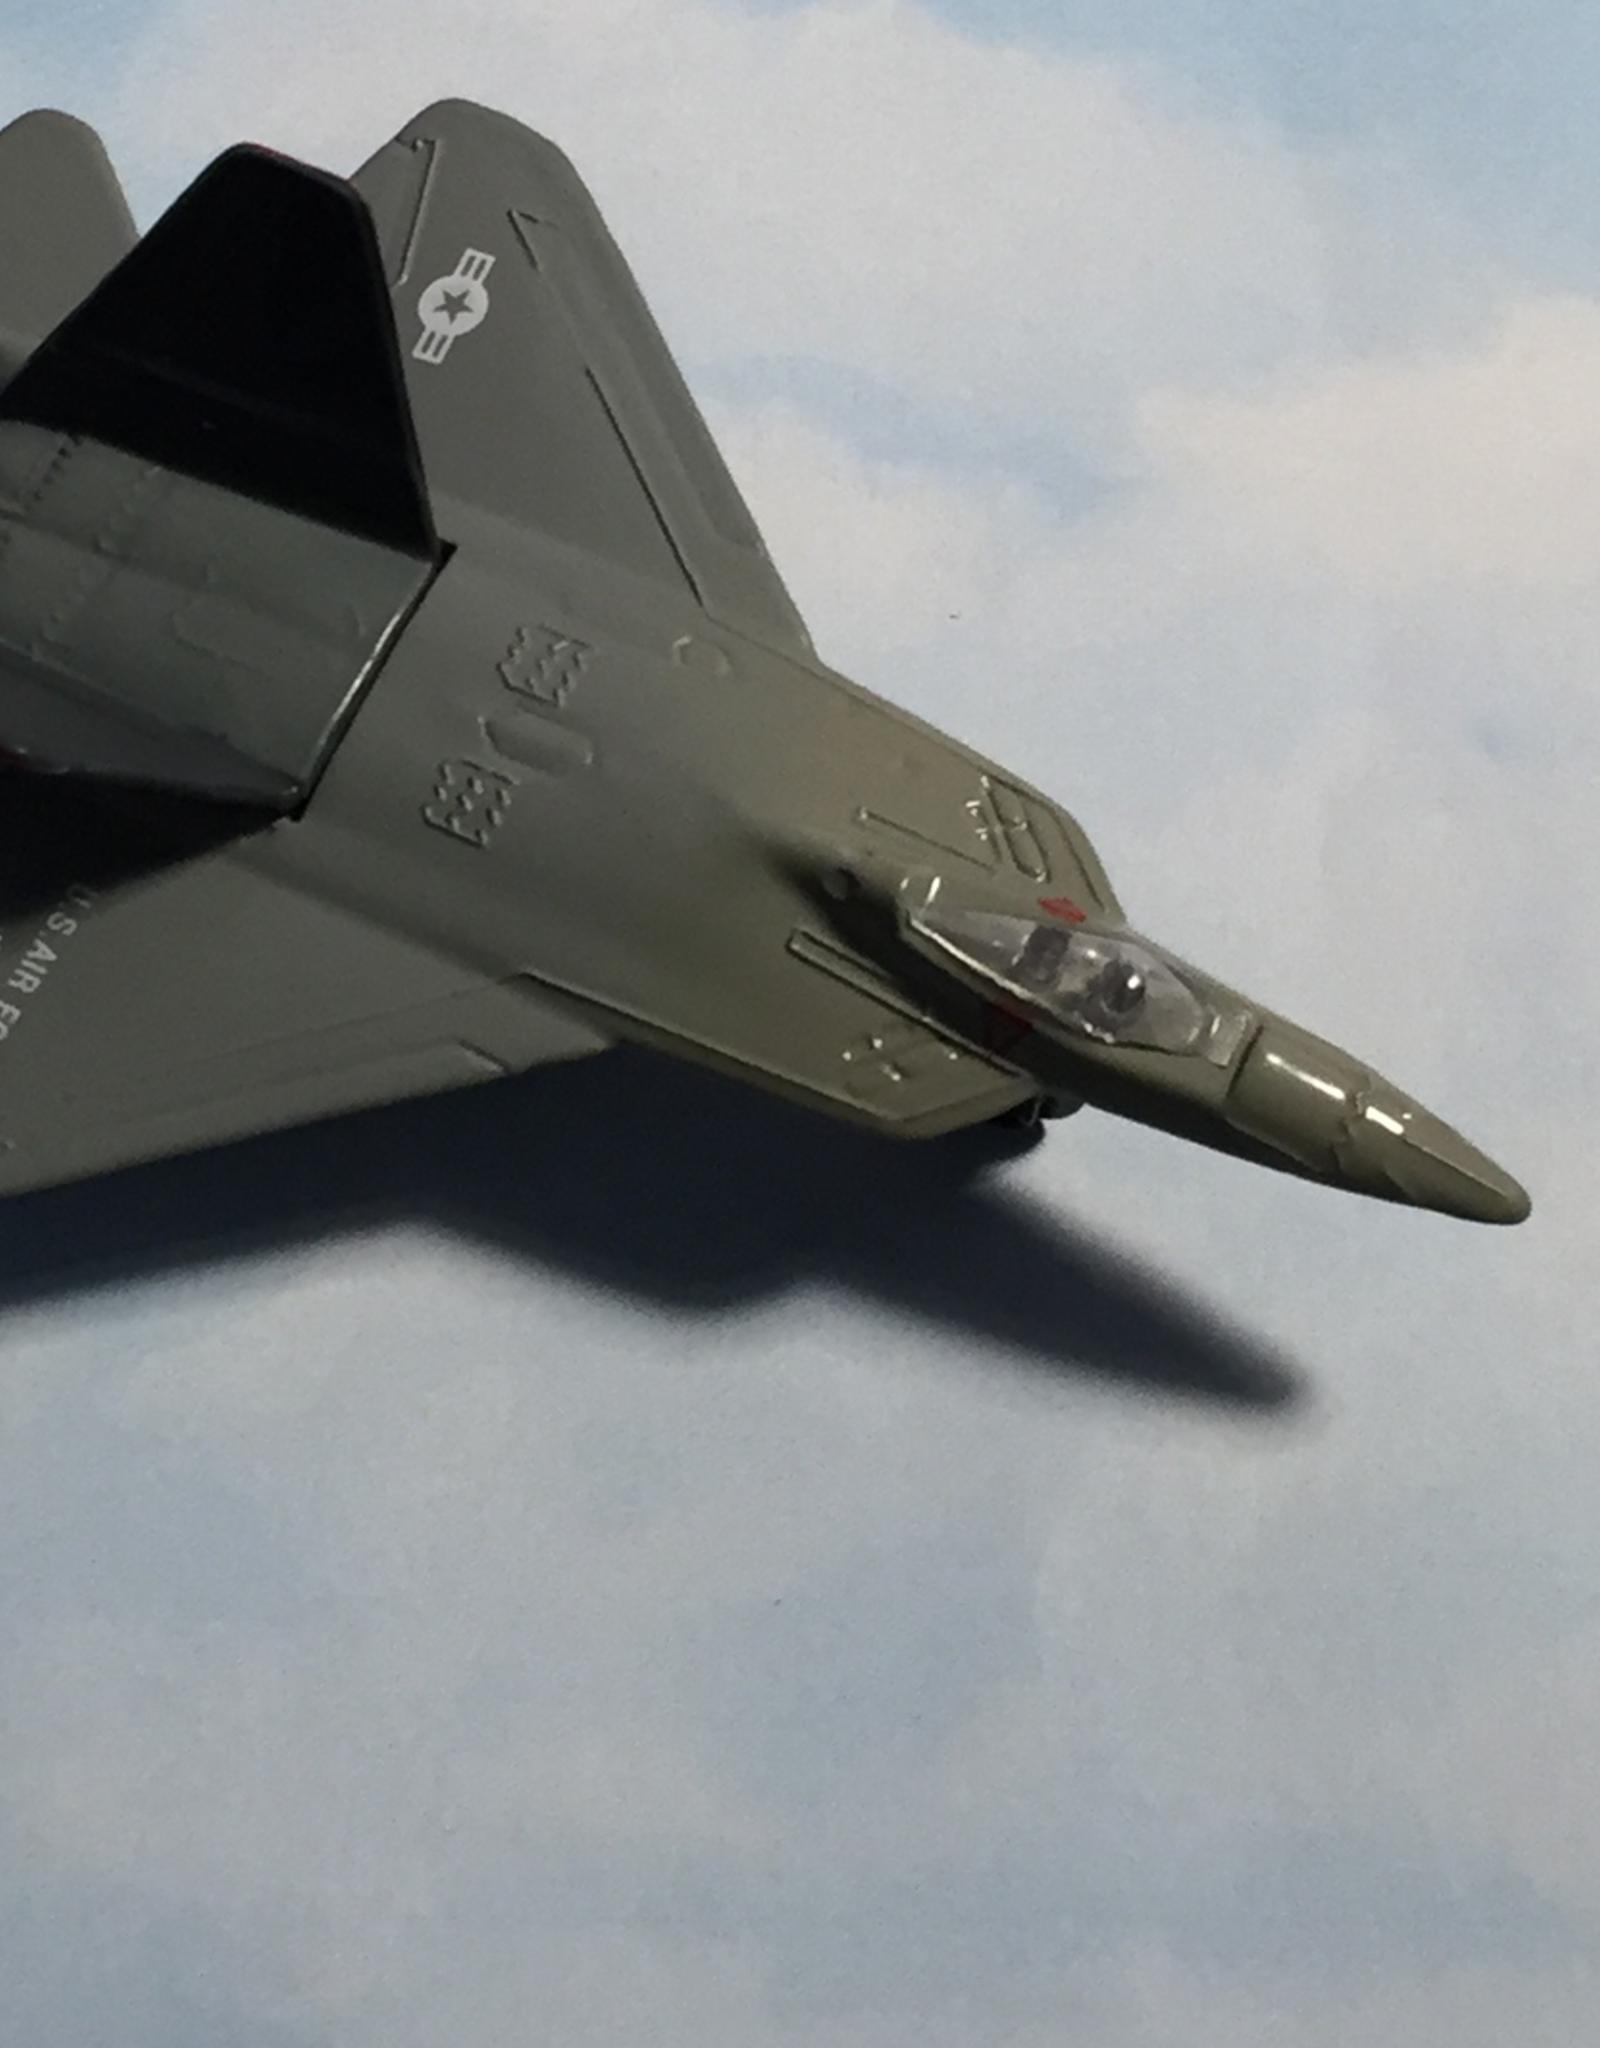 Hot Wings F-22 Raptor (Military)